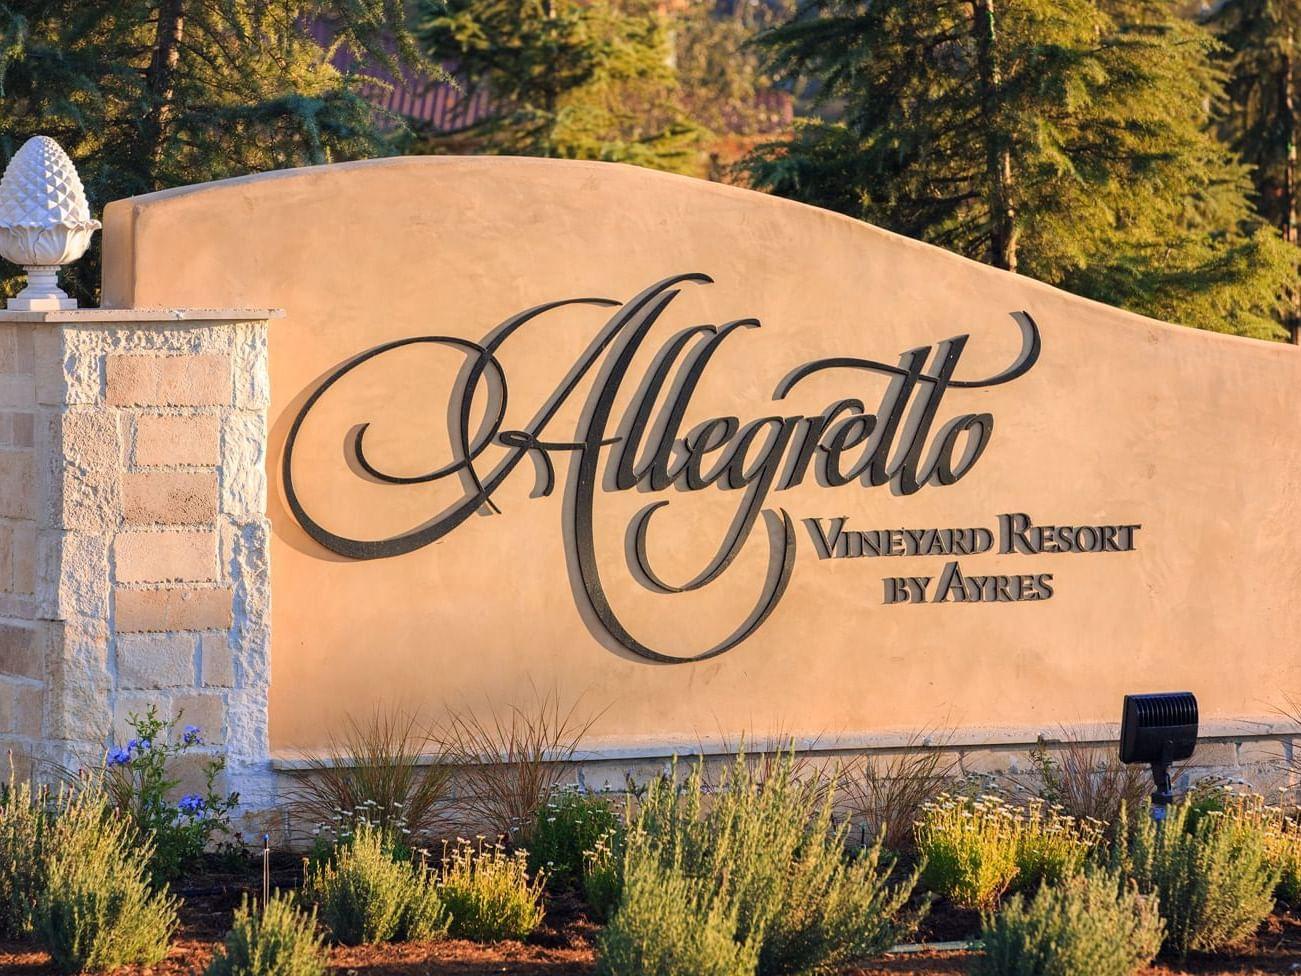 Allegretto Vineyard Resort sign at entrance